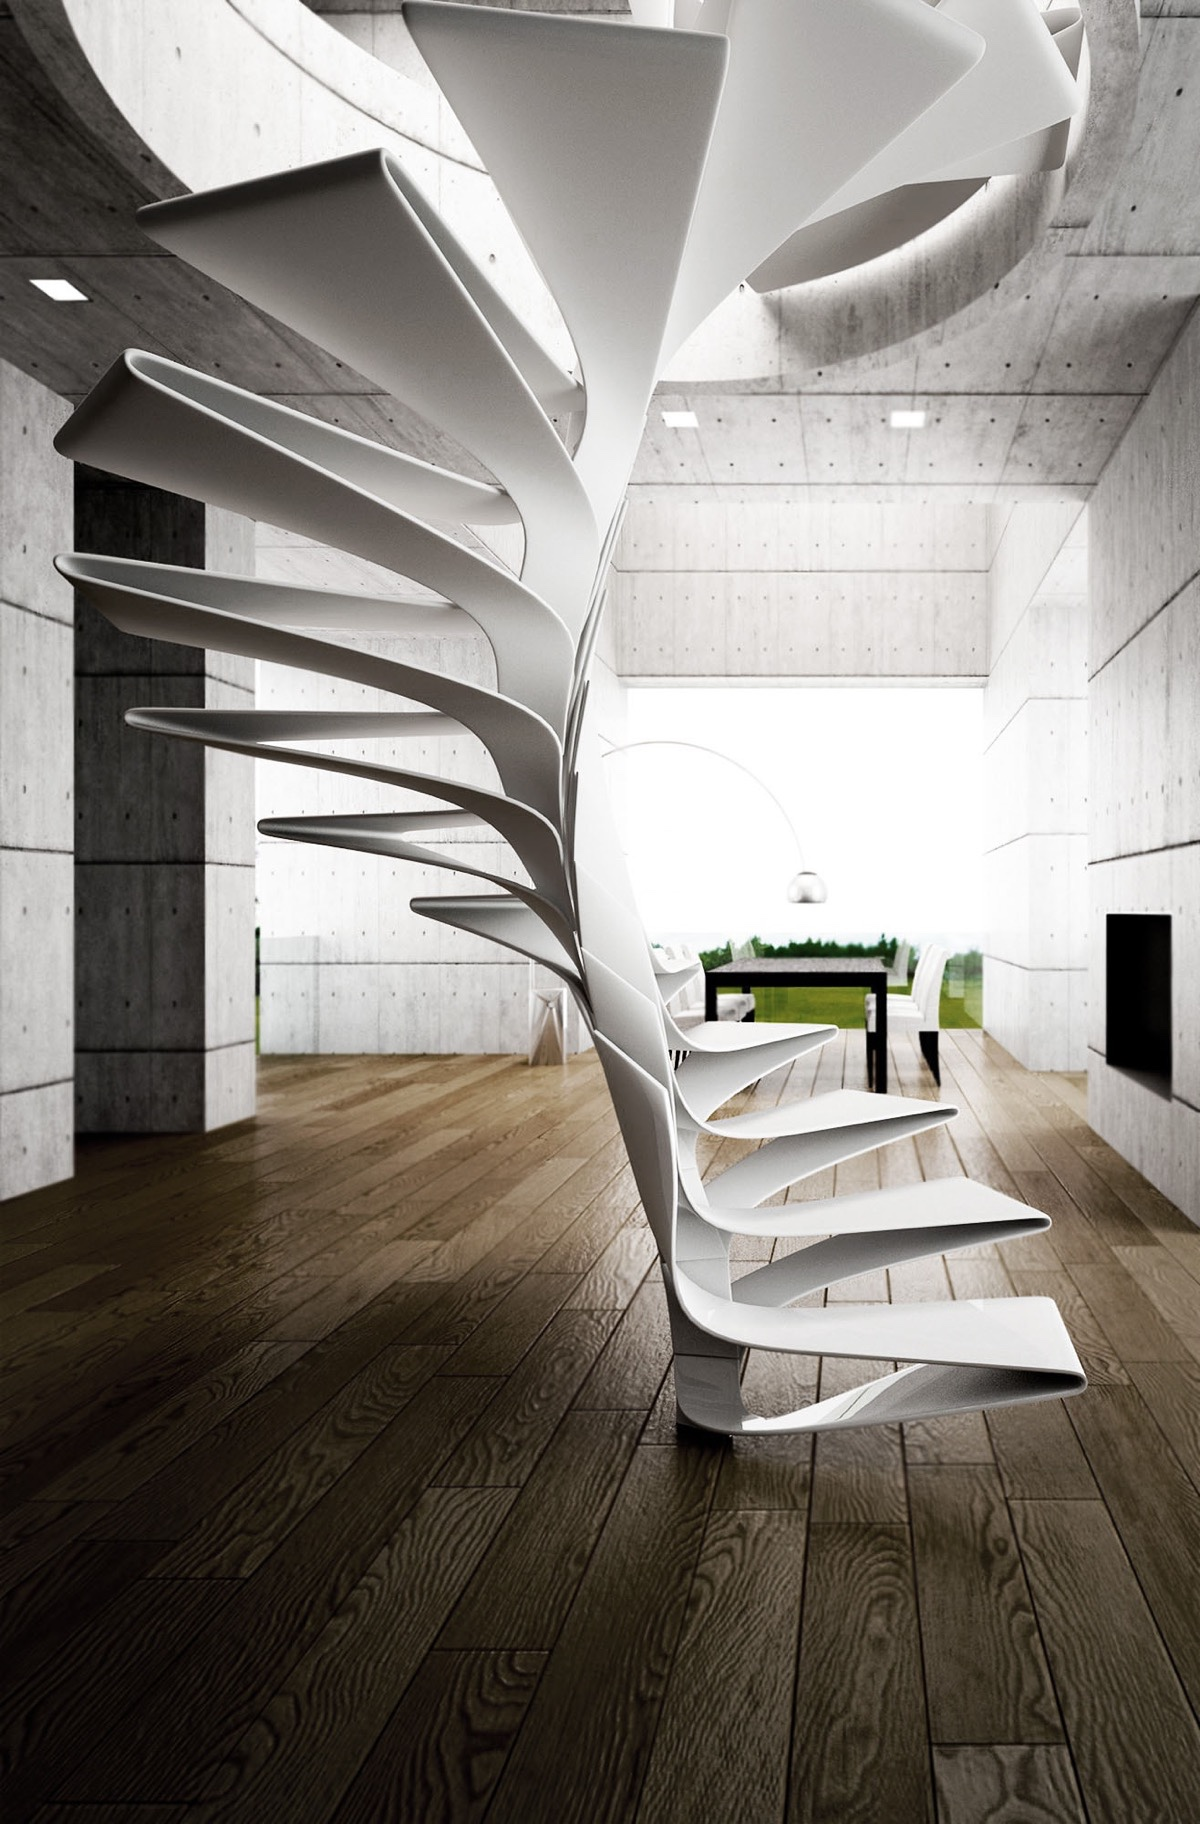 Interior Design Architecture: 25 Unique Staircase Designs To Take Center Stage In Your Home